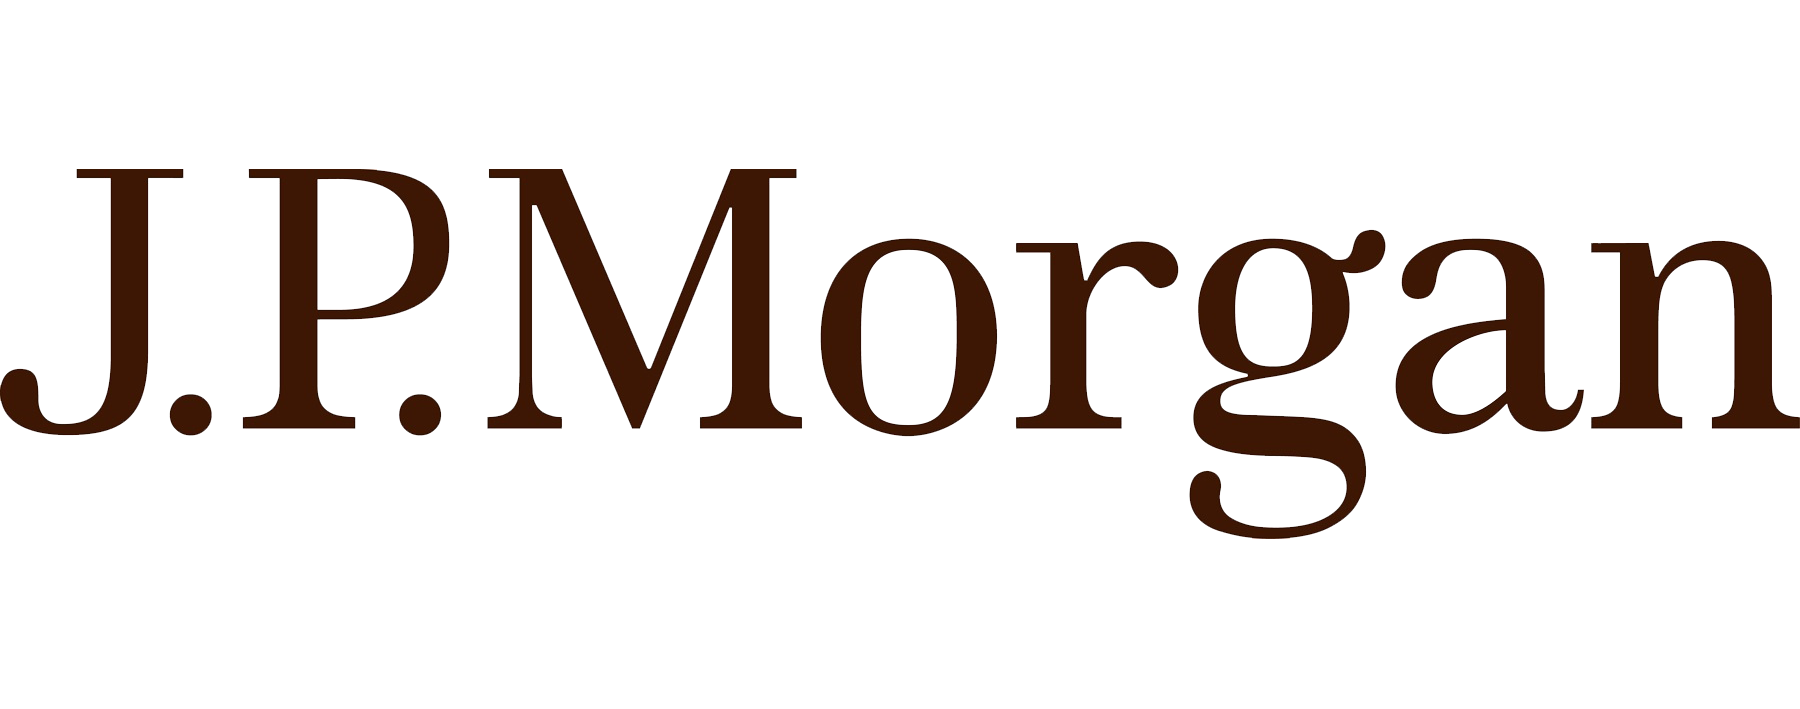 J.P.-Morgan-Logos-HD (1).png